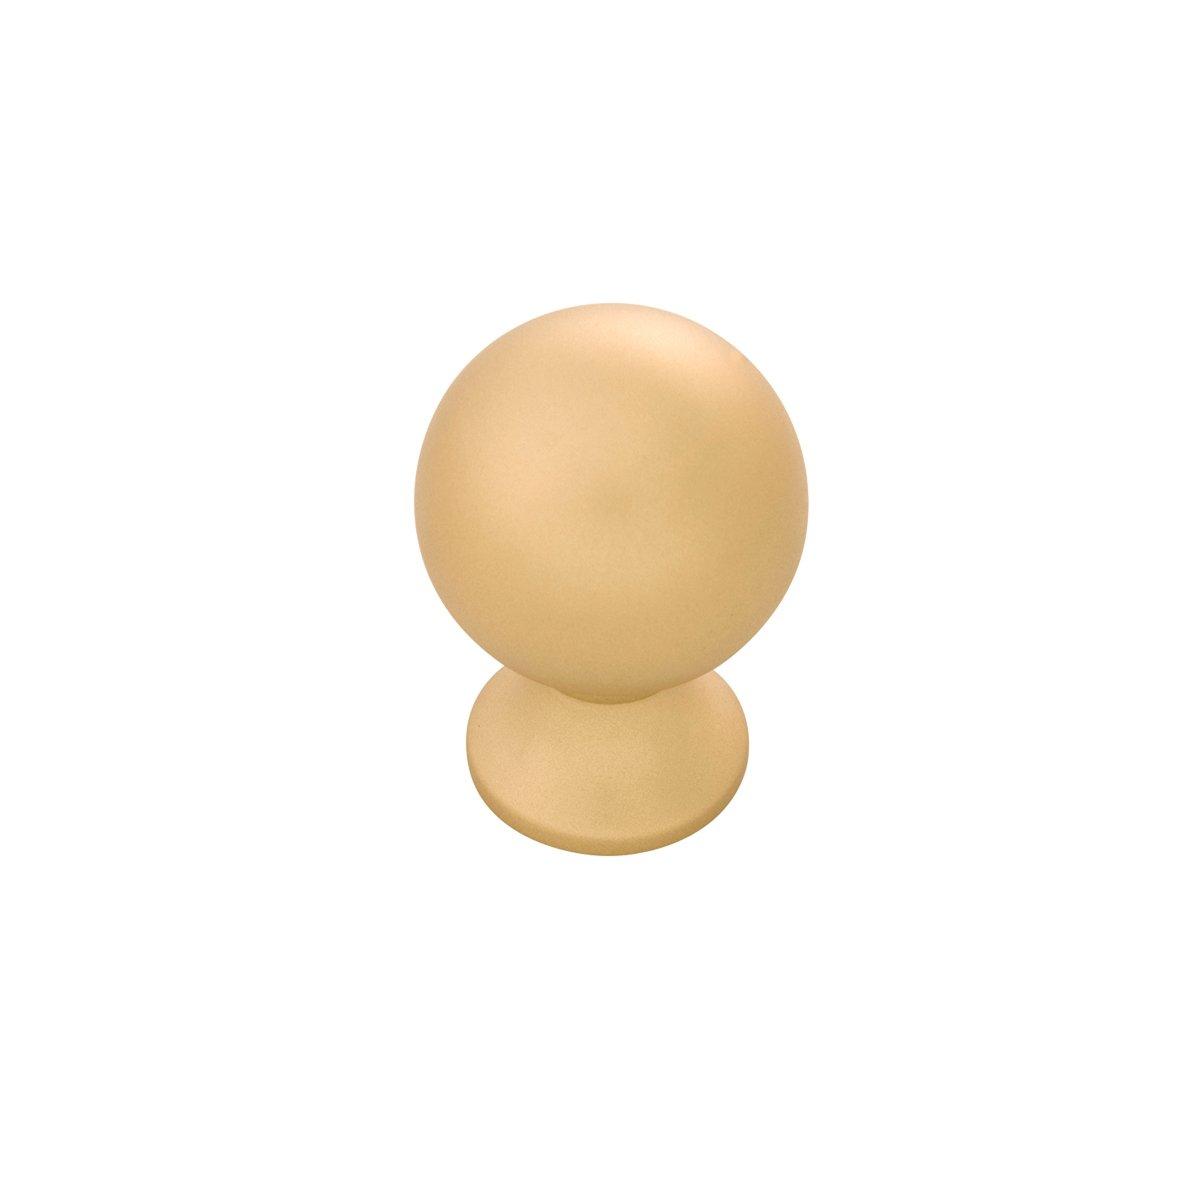 Belwith-Keeler B076288-FUB Fuller Collection 1 Diameter Knob Flat Ultra Brass